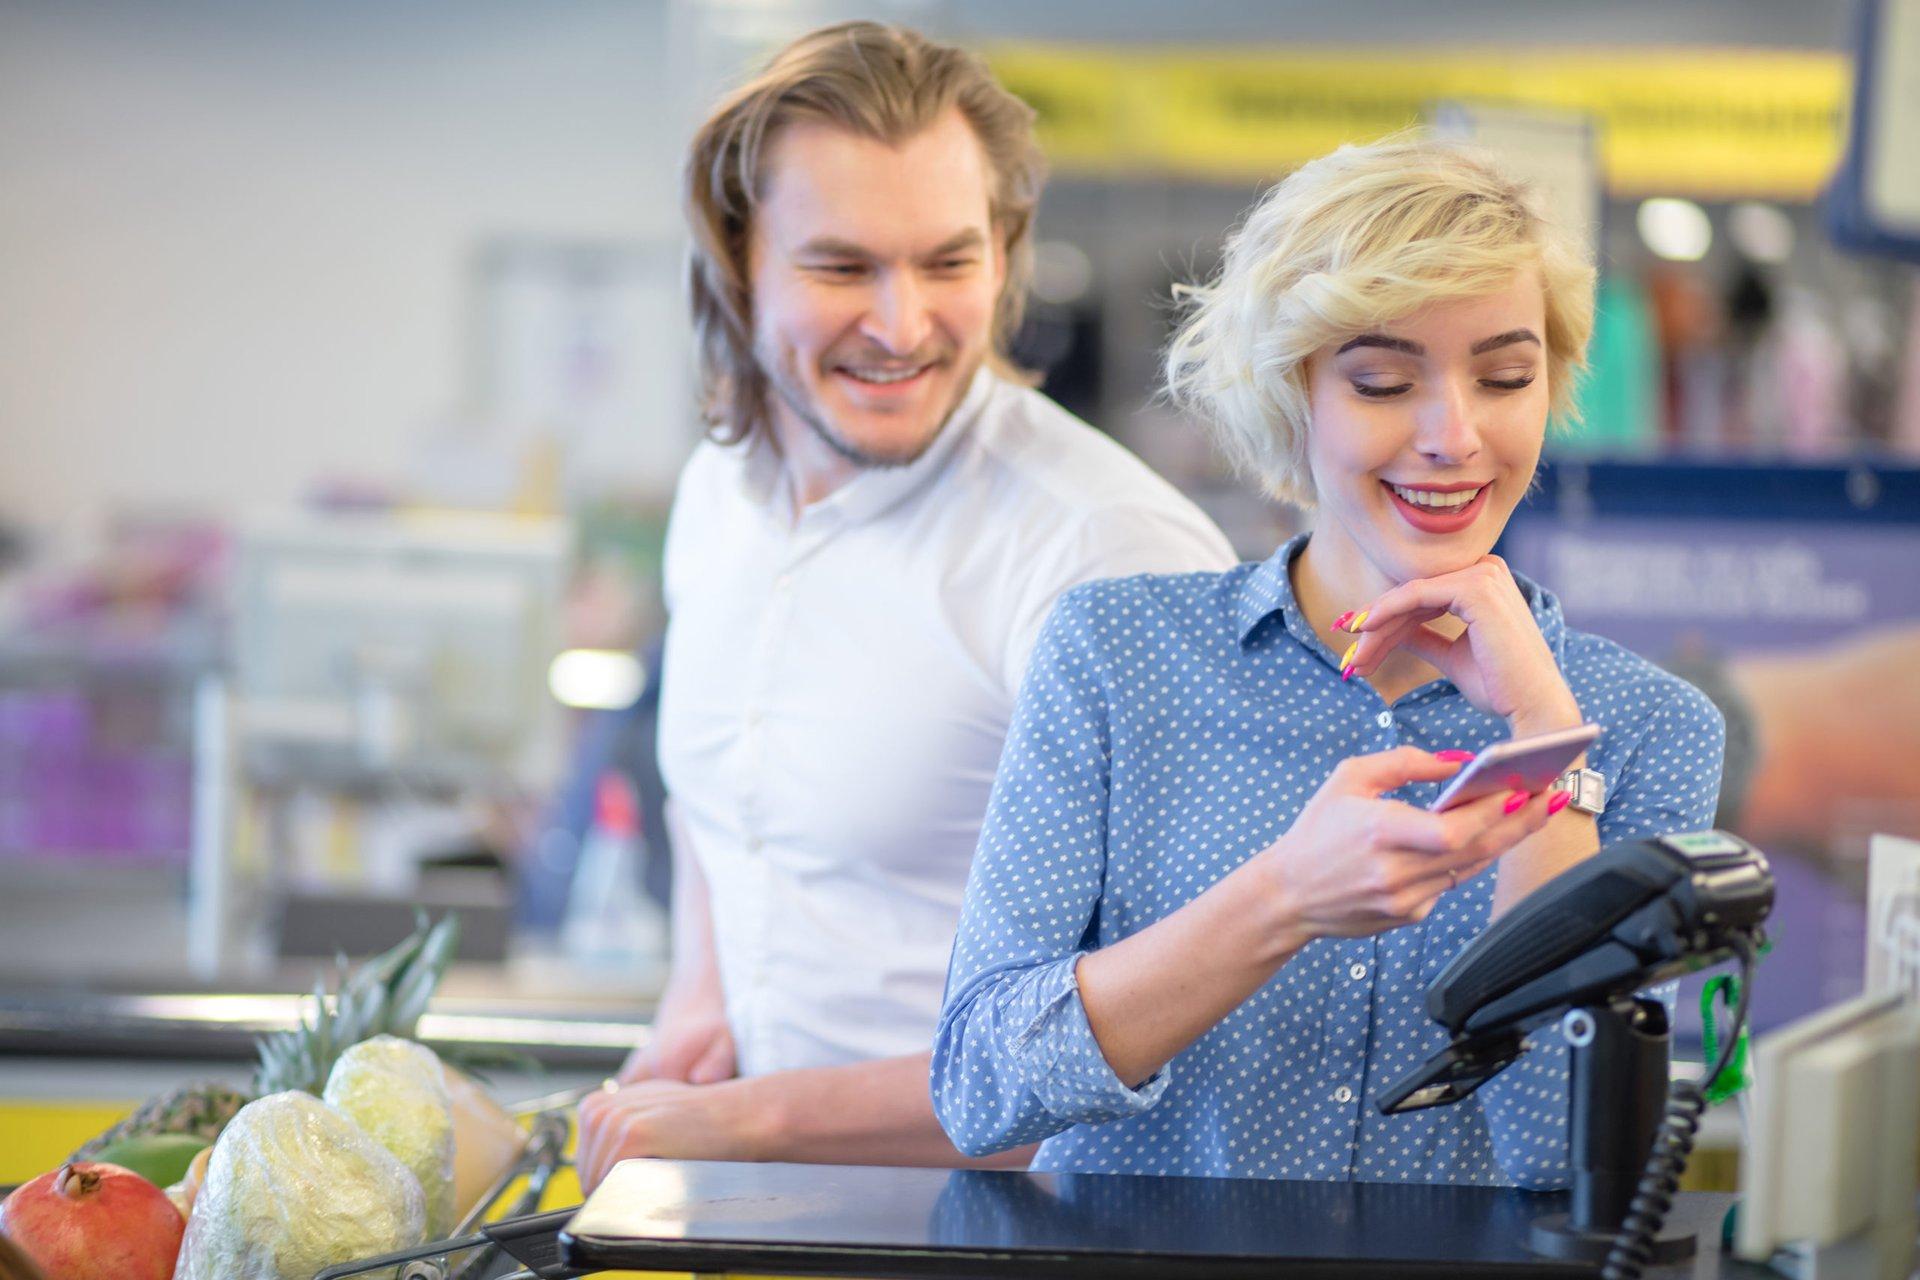 Woman using a digital coupon